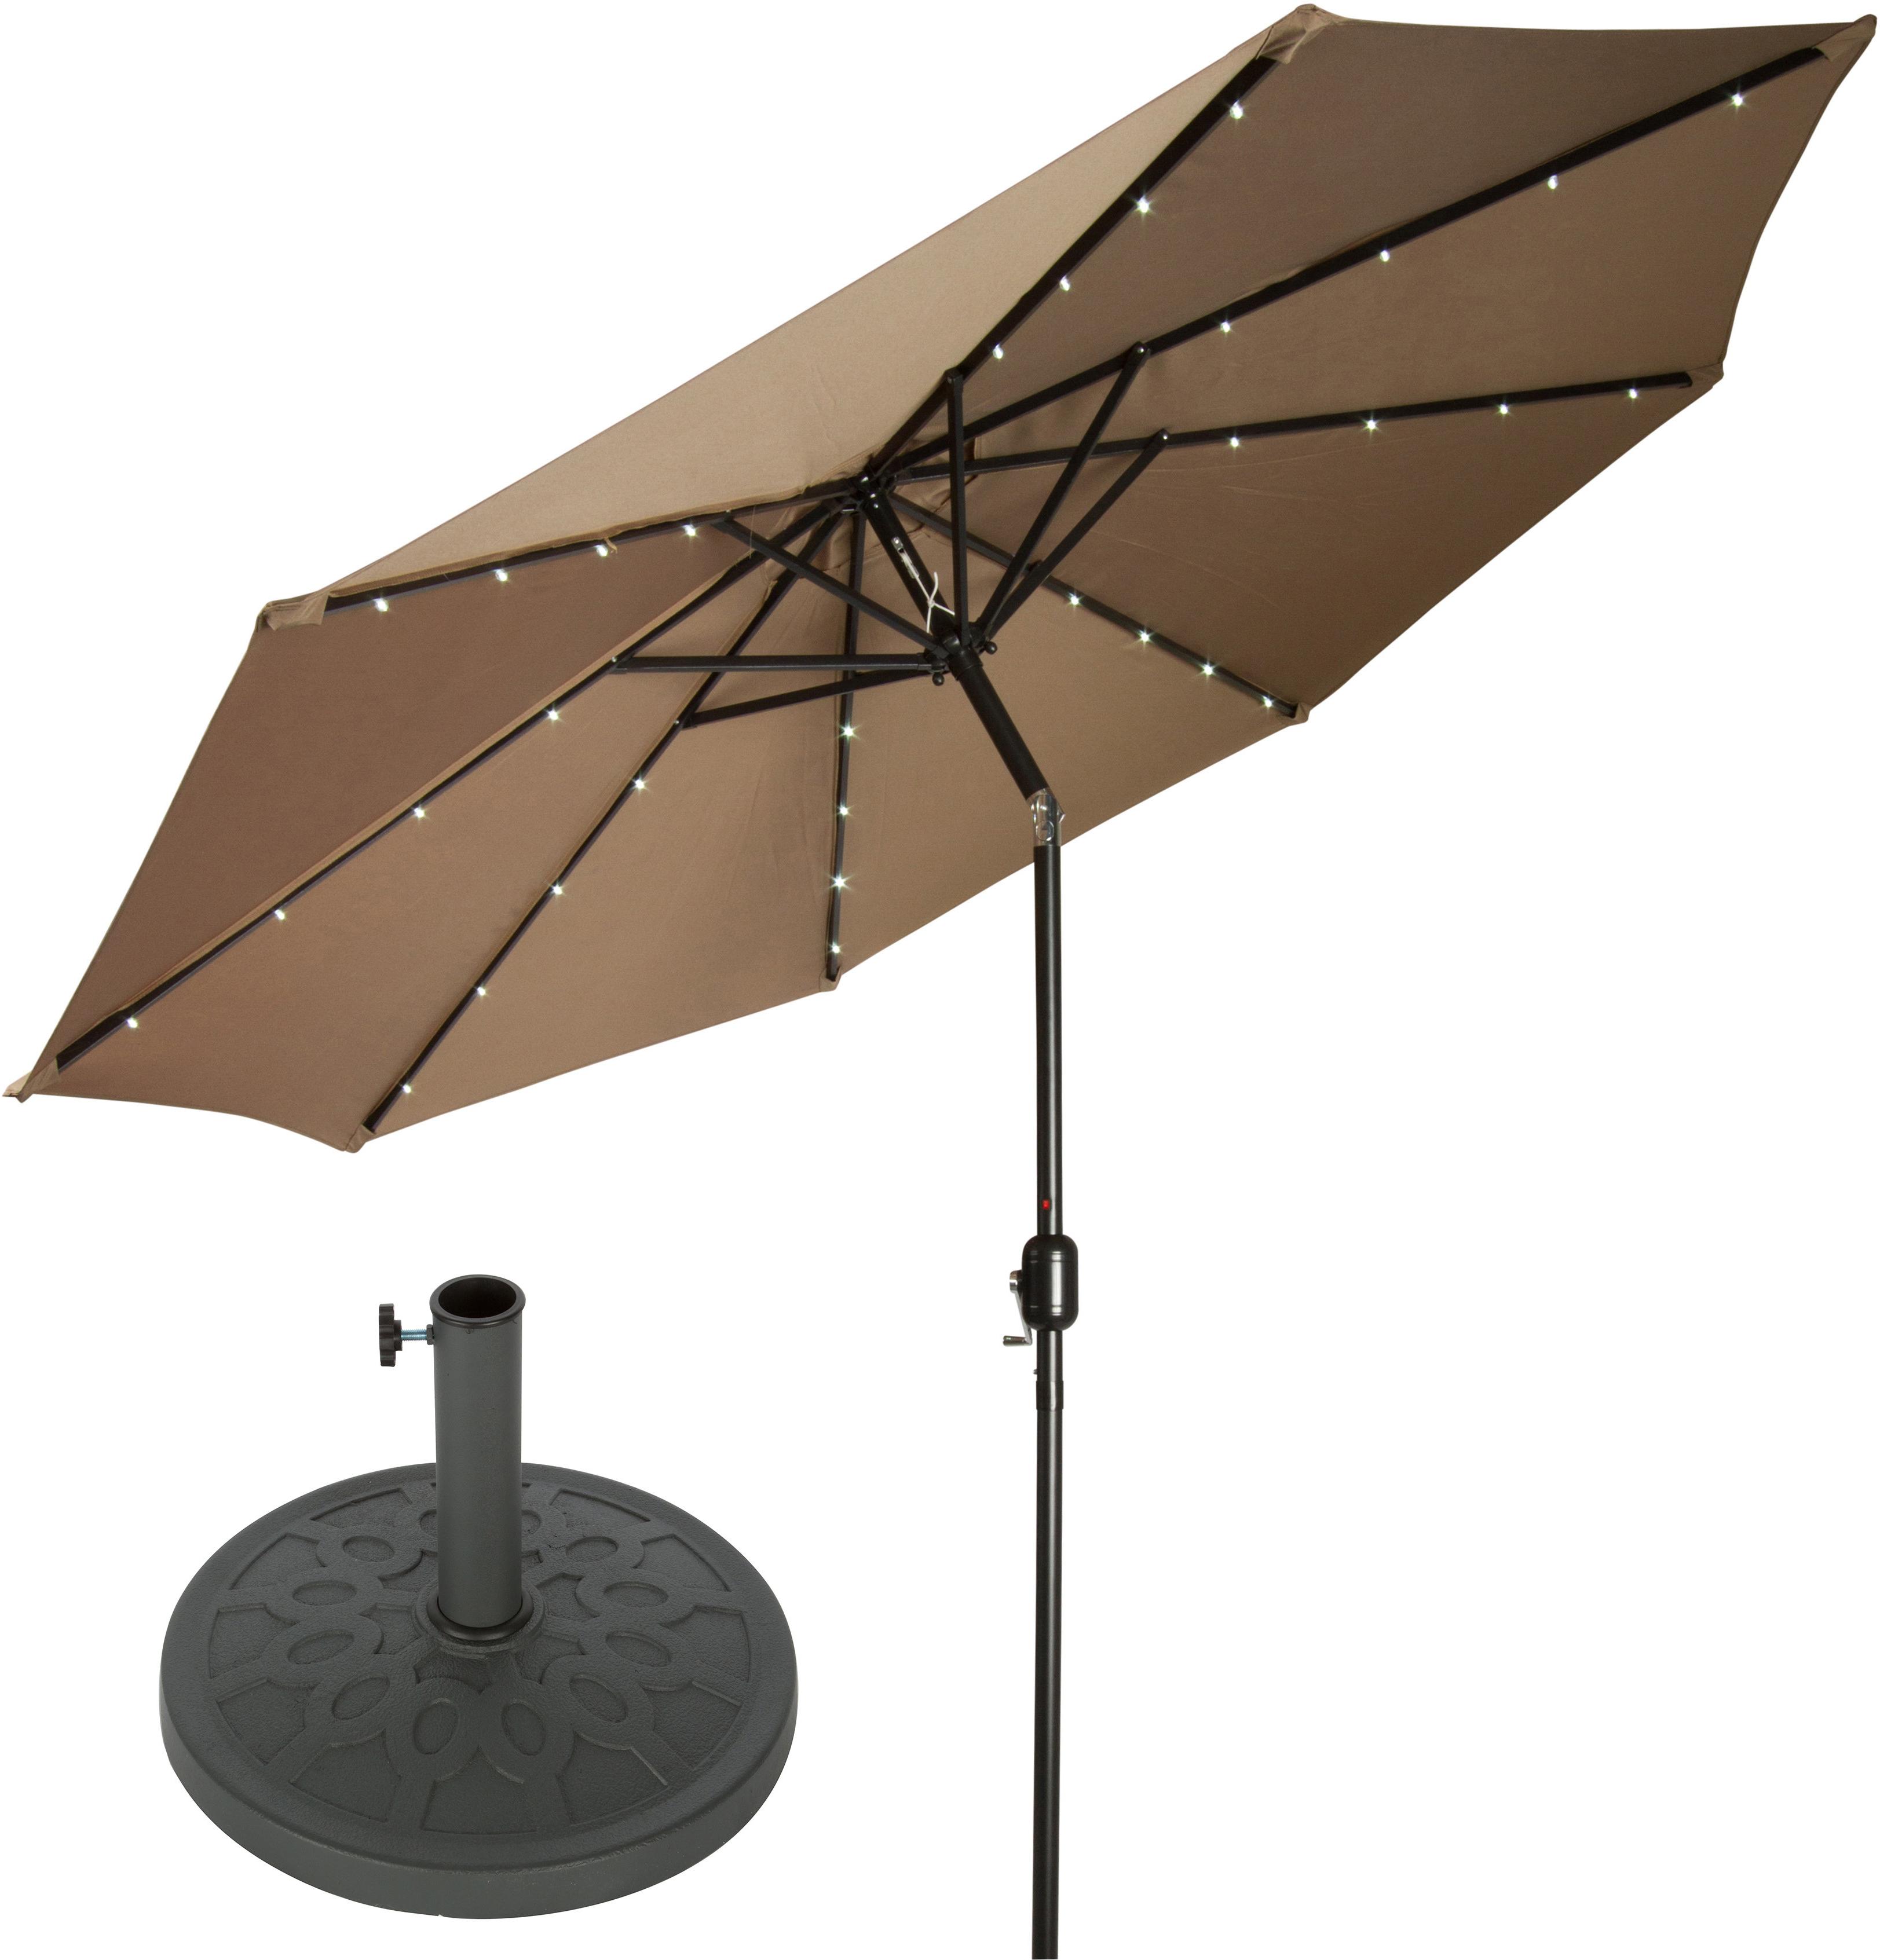 Branscum 9' Lighted Umbrella Within Well Liked Hettie Solar Lighted Market Umbrellas (Gallery 6 of 20)